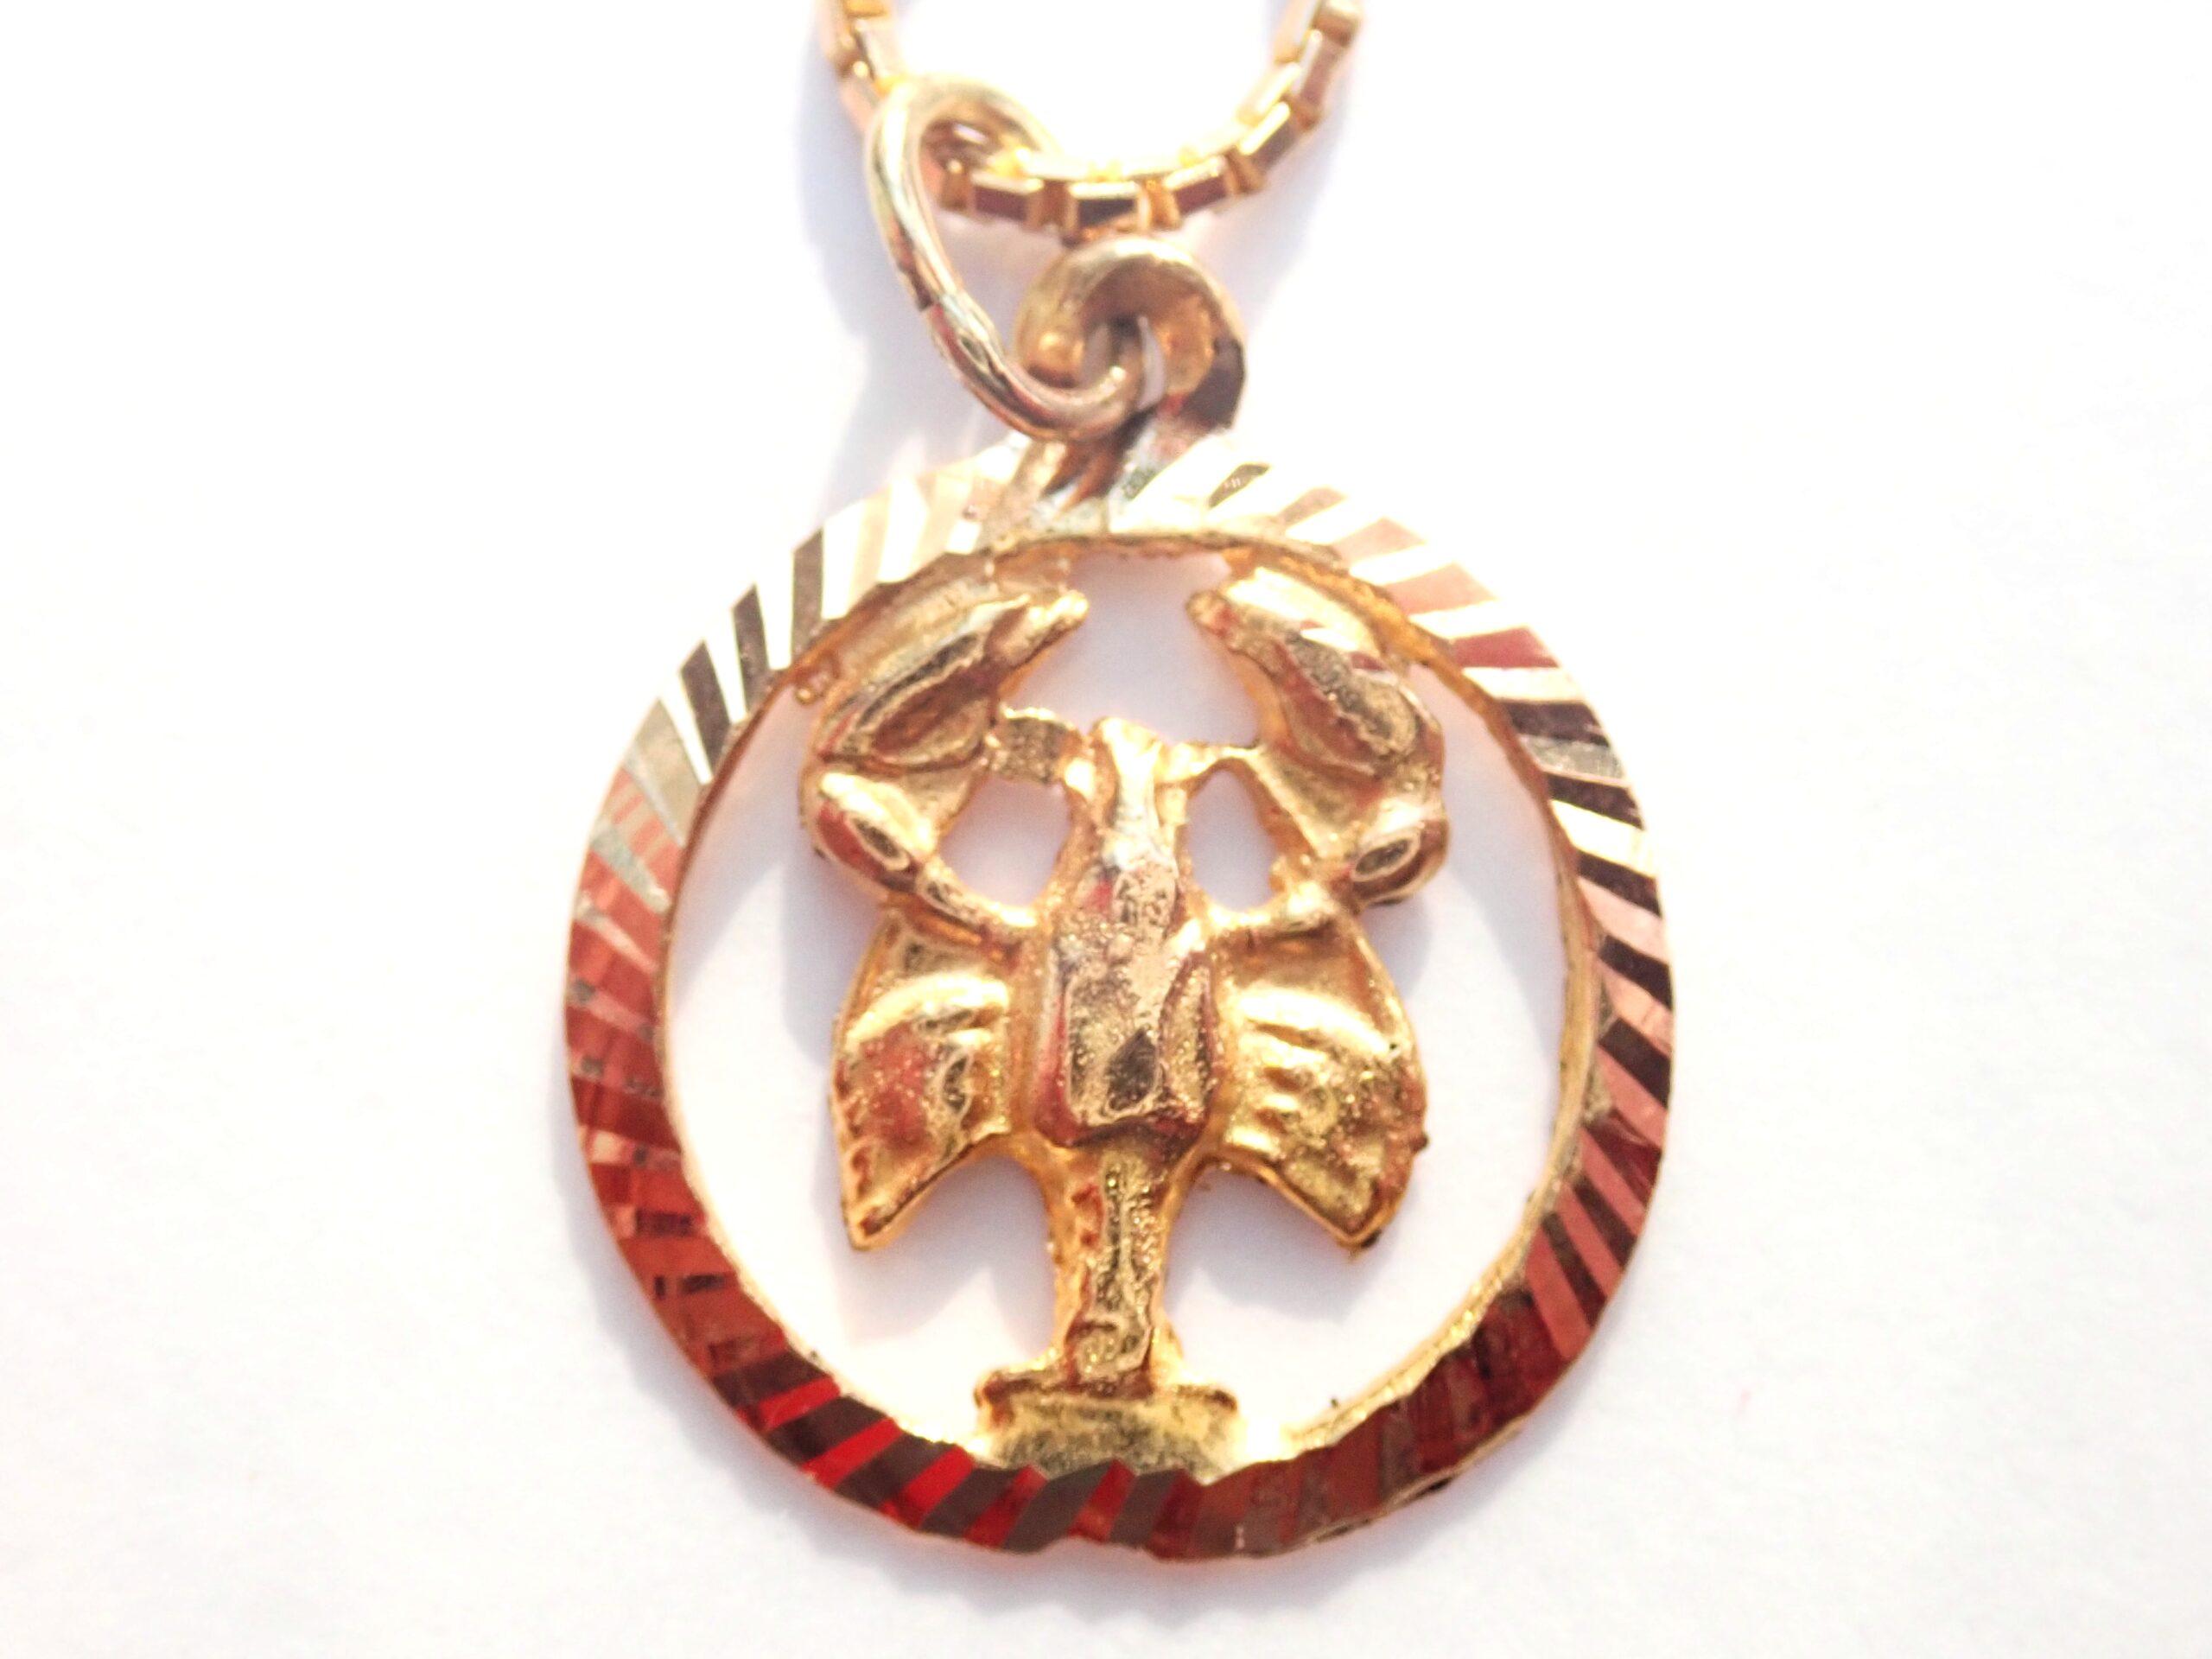 14k Solid Gold Scorpio October Star Sign Scorpion Pendant -14k 18″ Box Chain 5.6gms #150